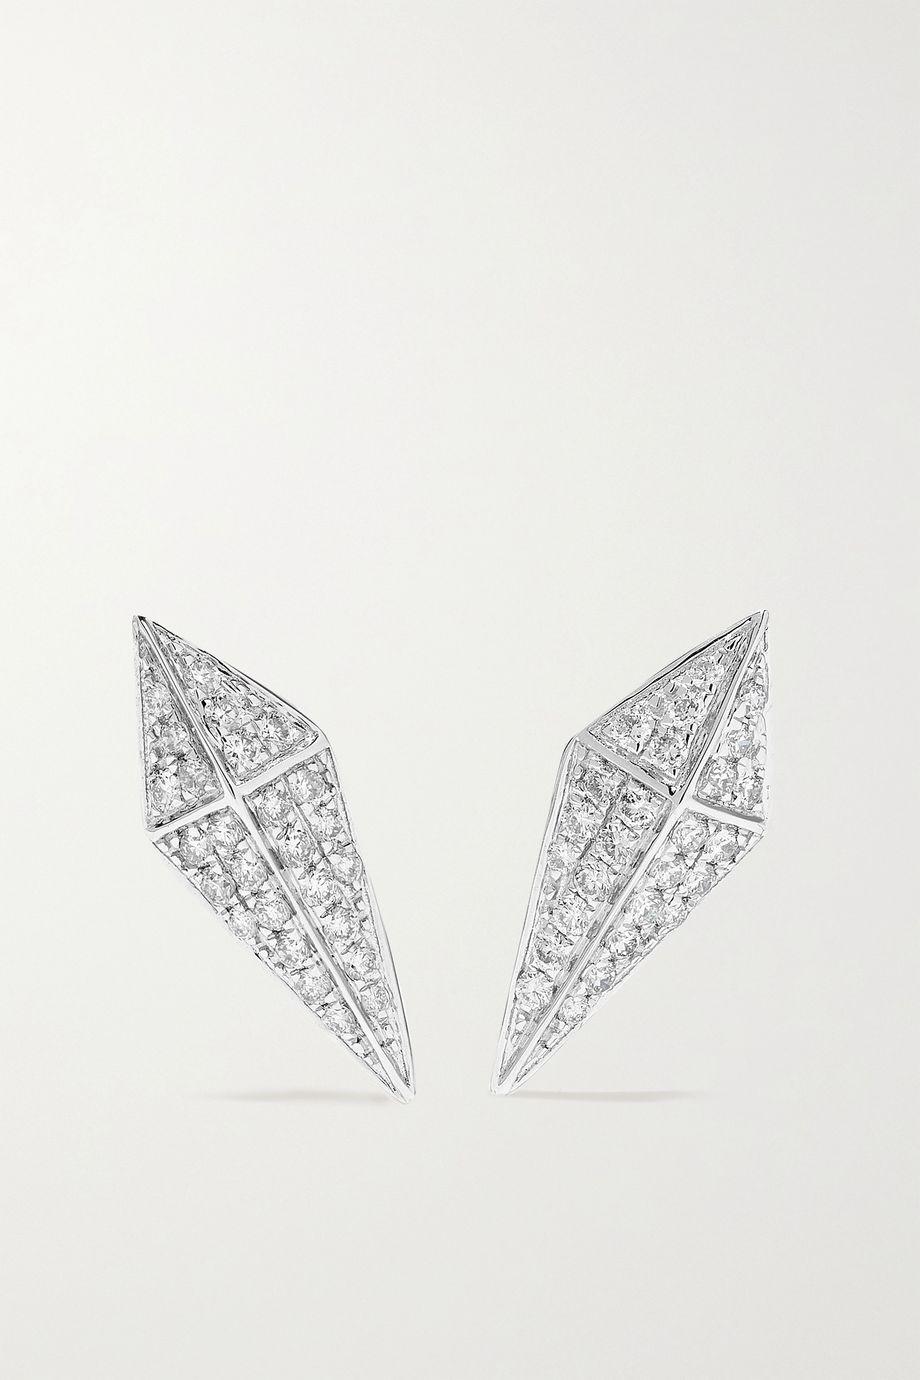 OFIRA 18-karat white gold diamond earrings